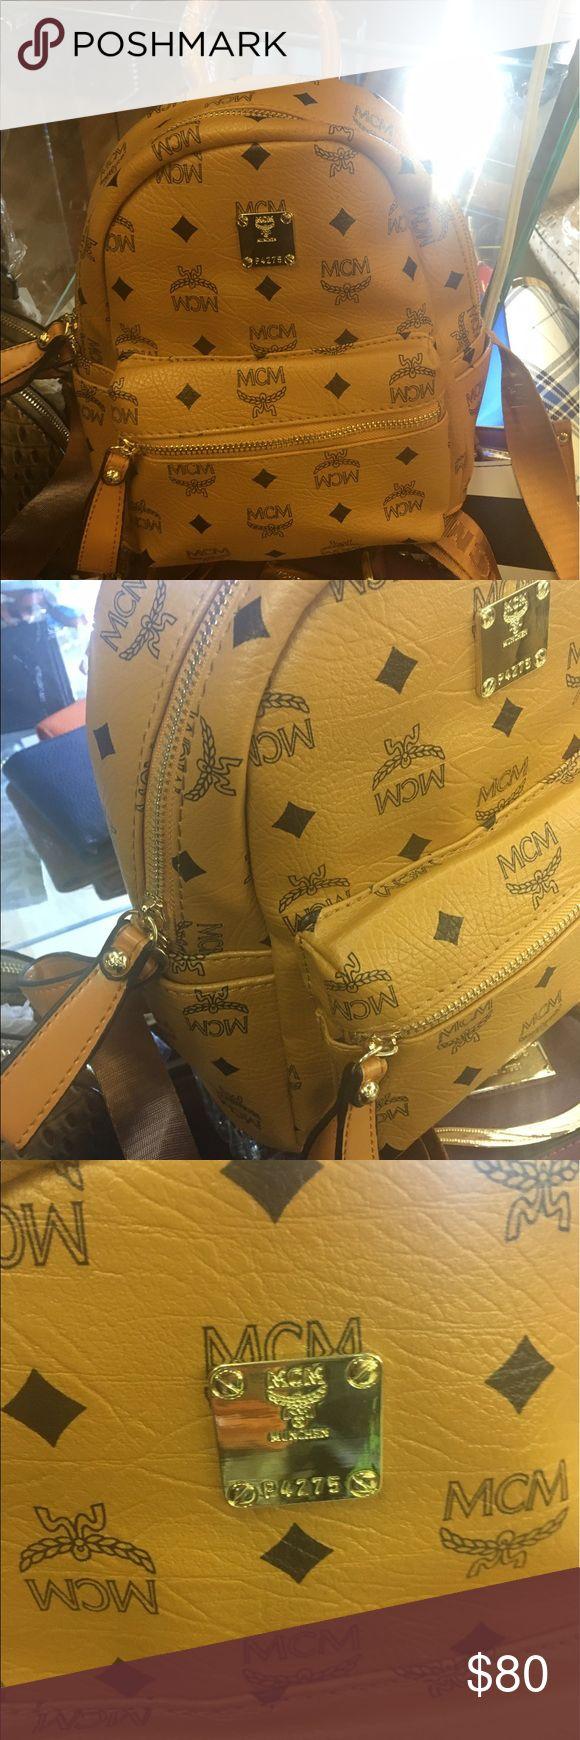 Medium size Mcm bookbag backpack Brand new. Price firm. MCM Bags Backpacks